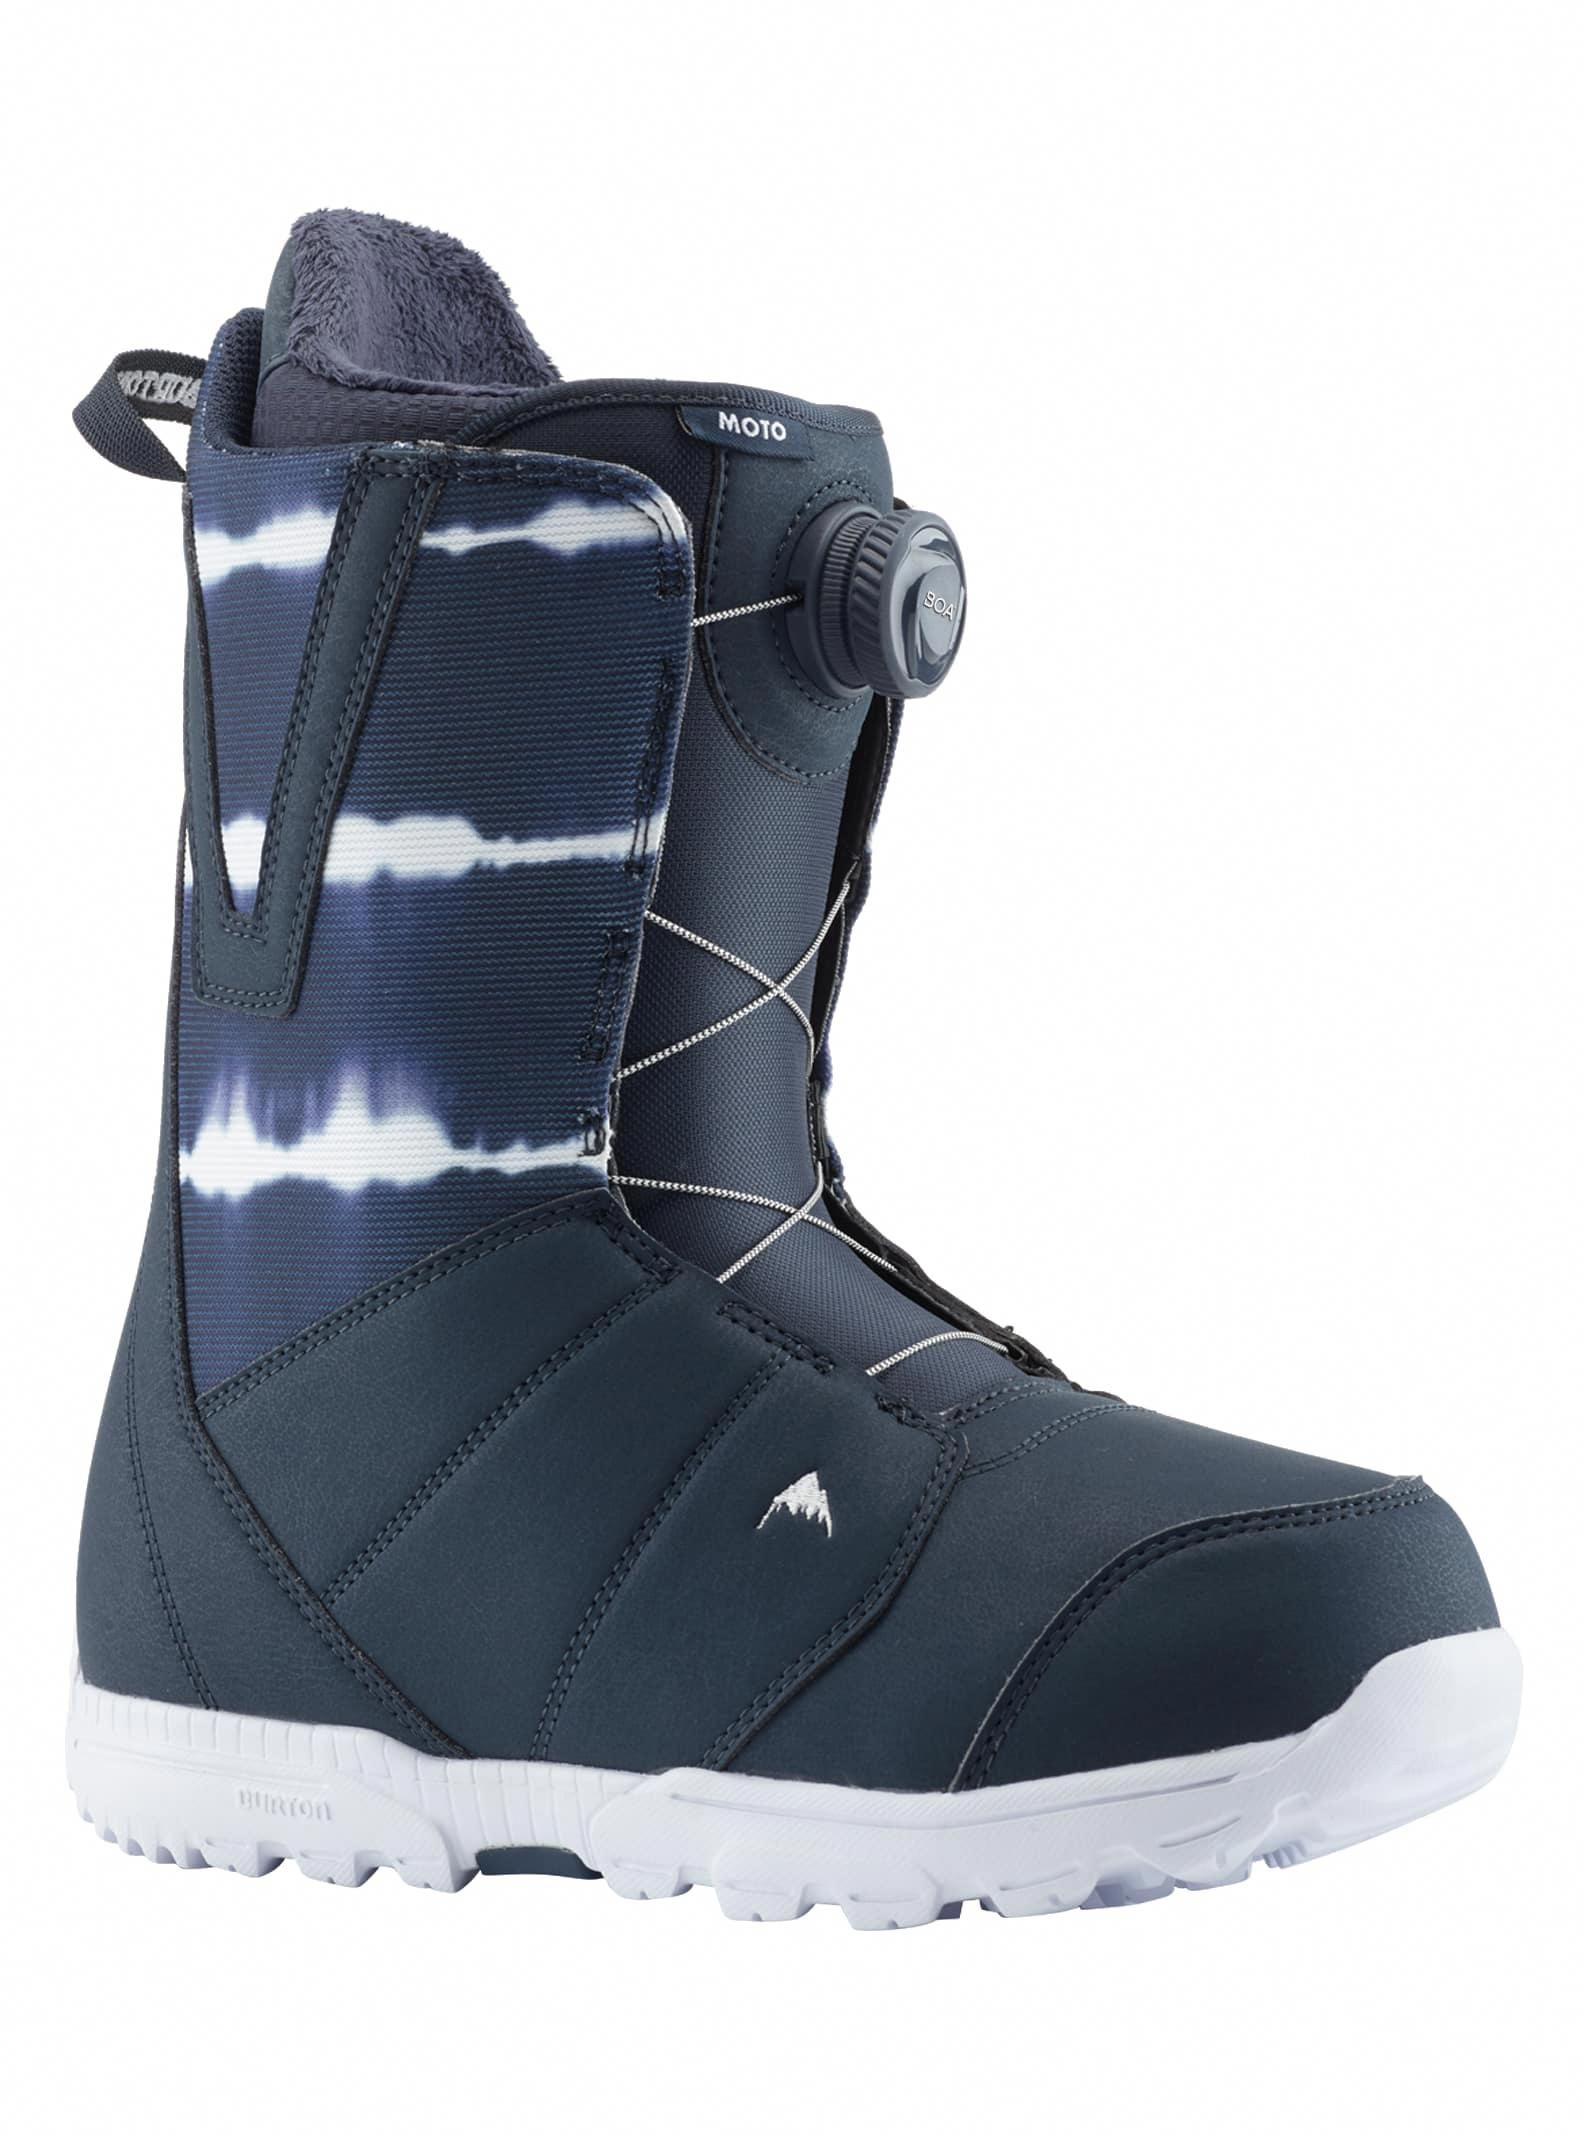 8bcc5de16c72 Men s Burton Moto Boa® Snowboard Boot  WinterFun